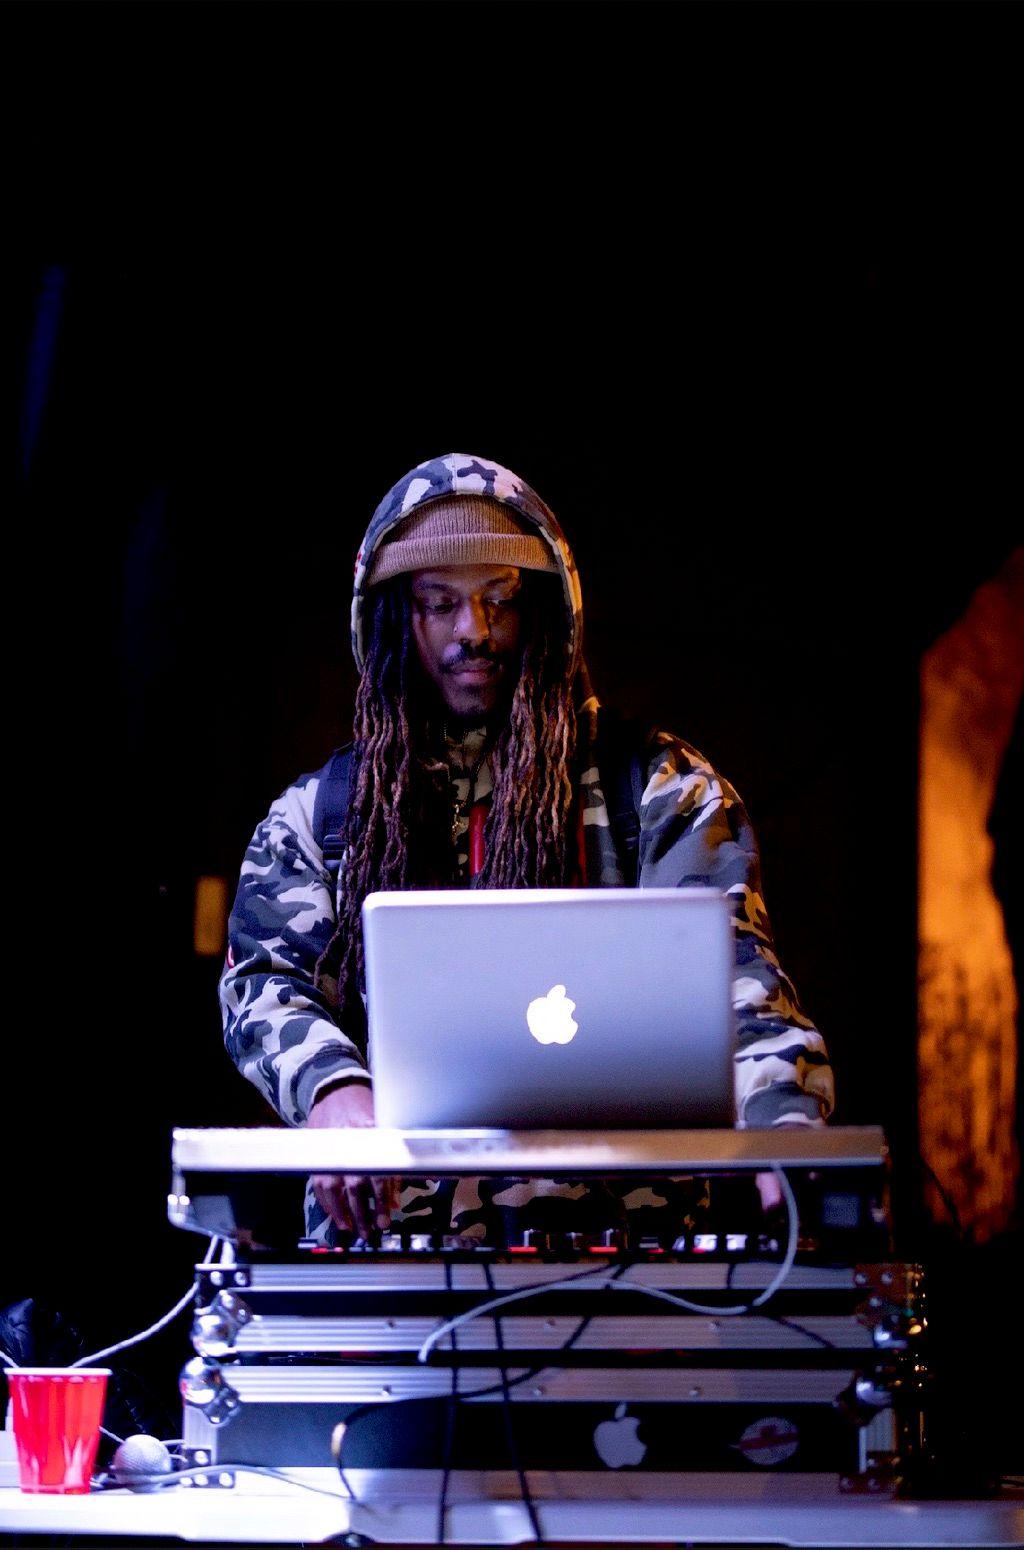 DJ COLEBLOODED